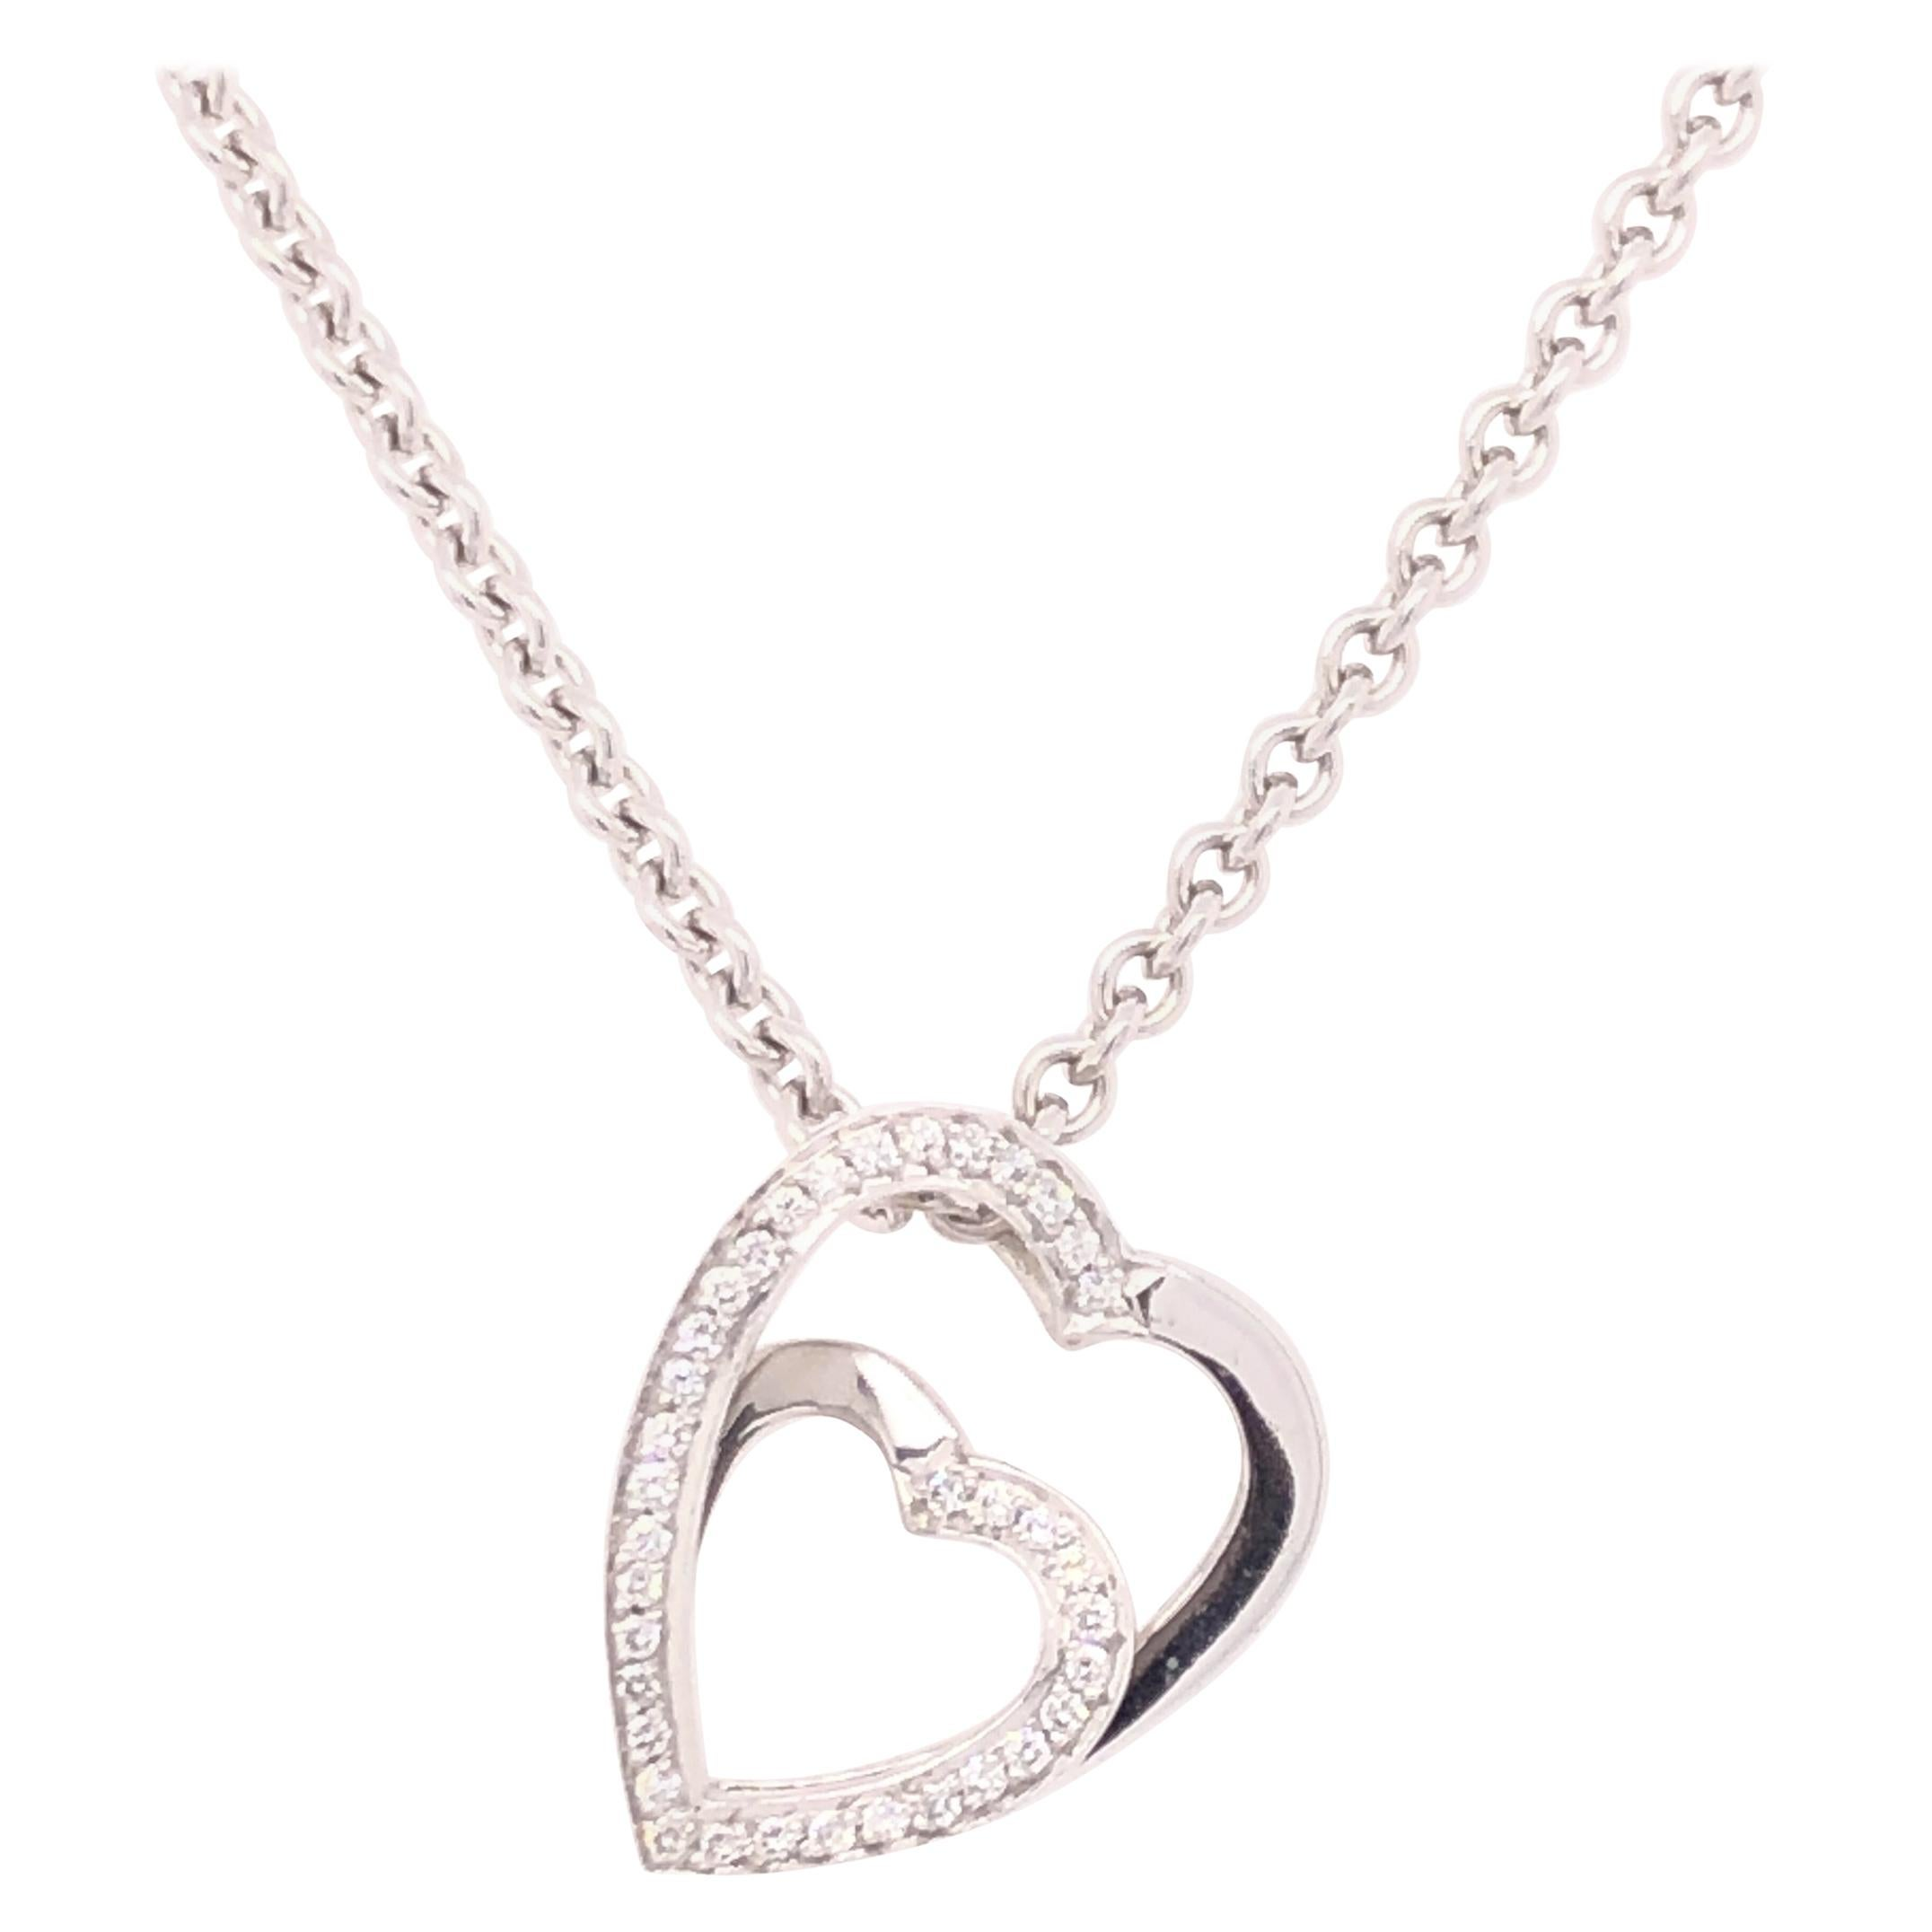 Cartier Double Heart Diamond Necklace